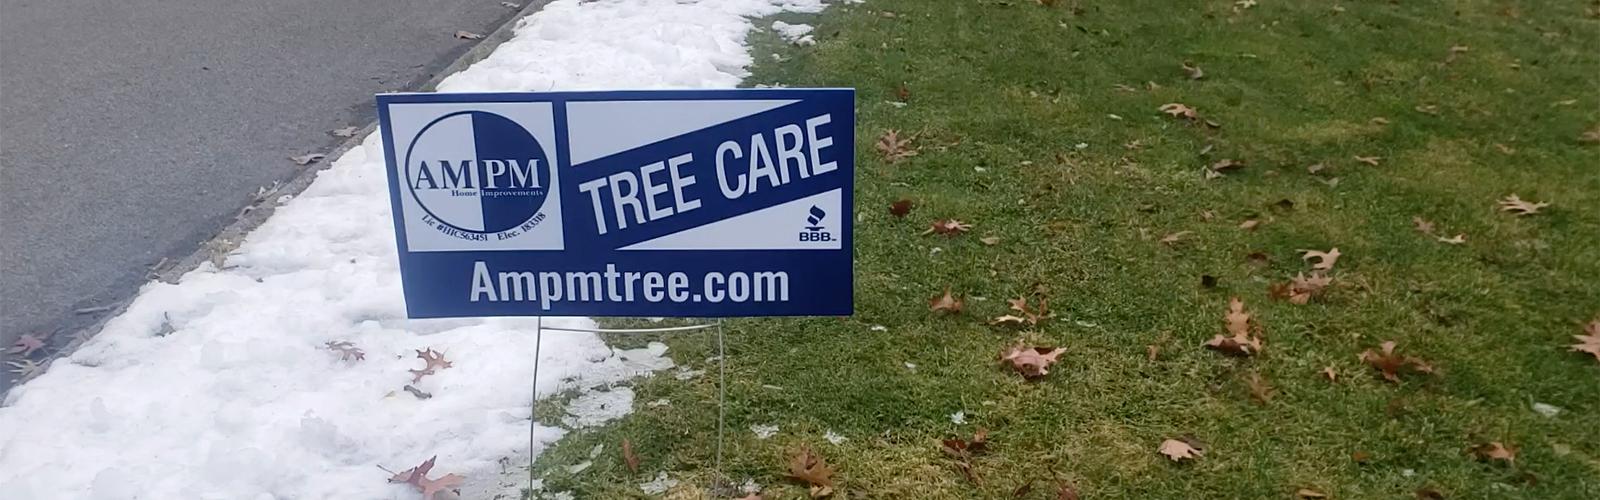 tree care companies near me